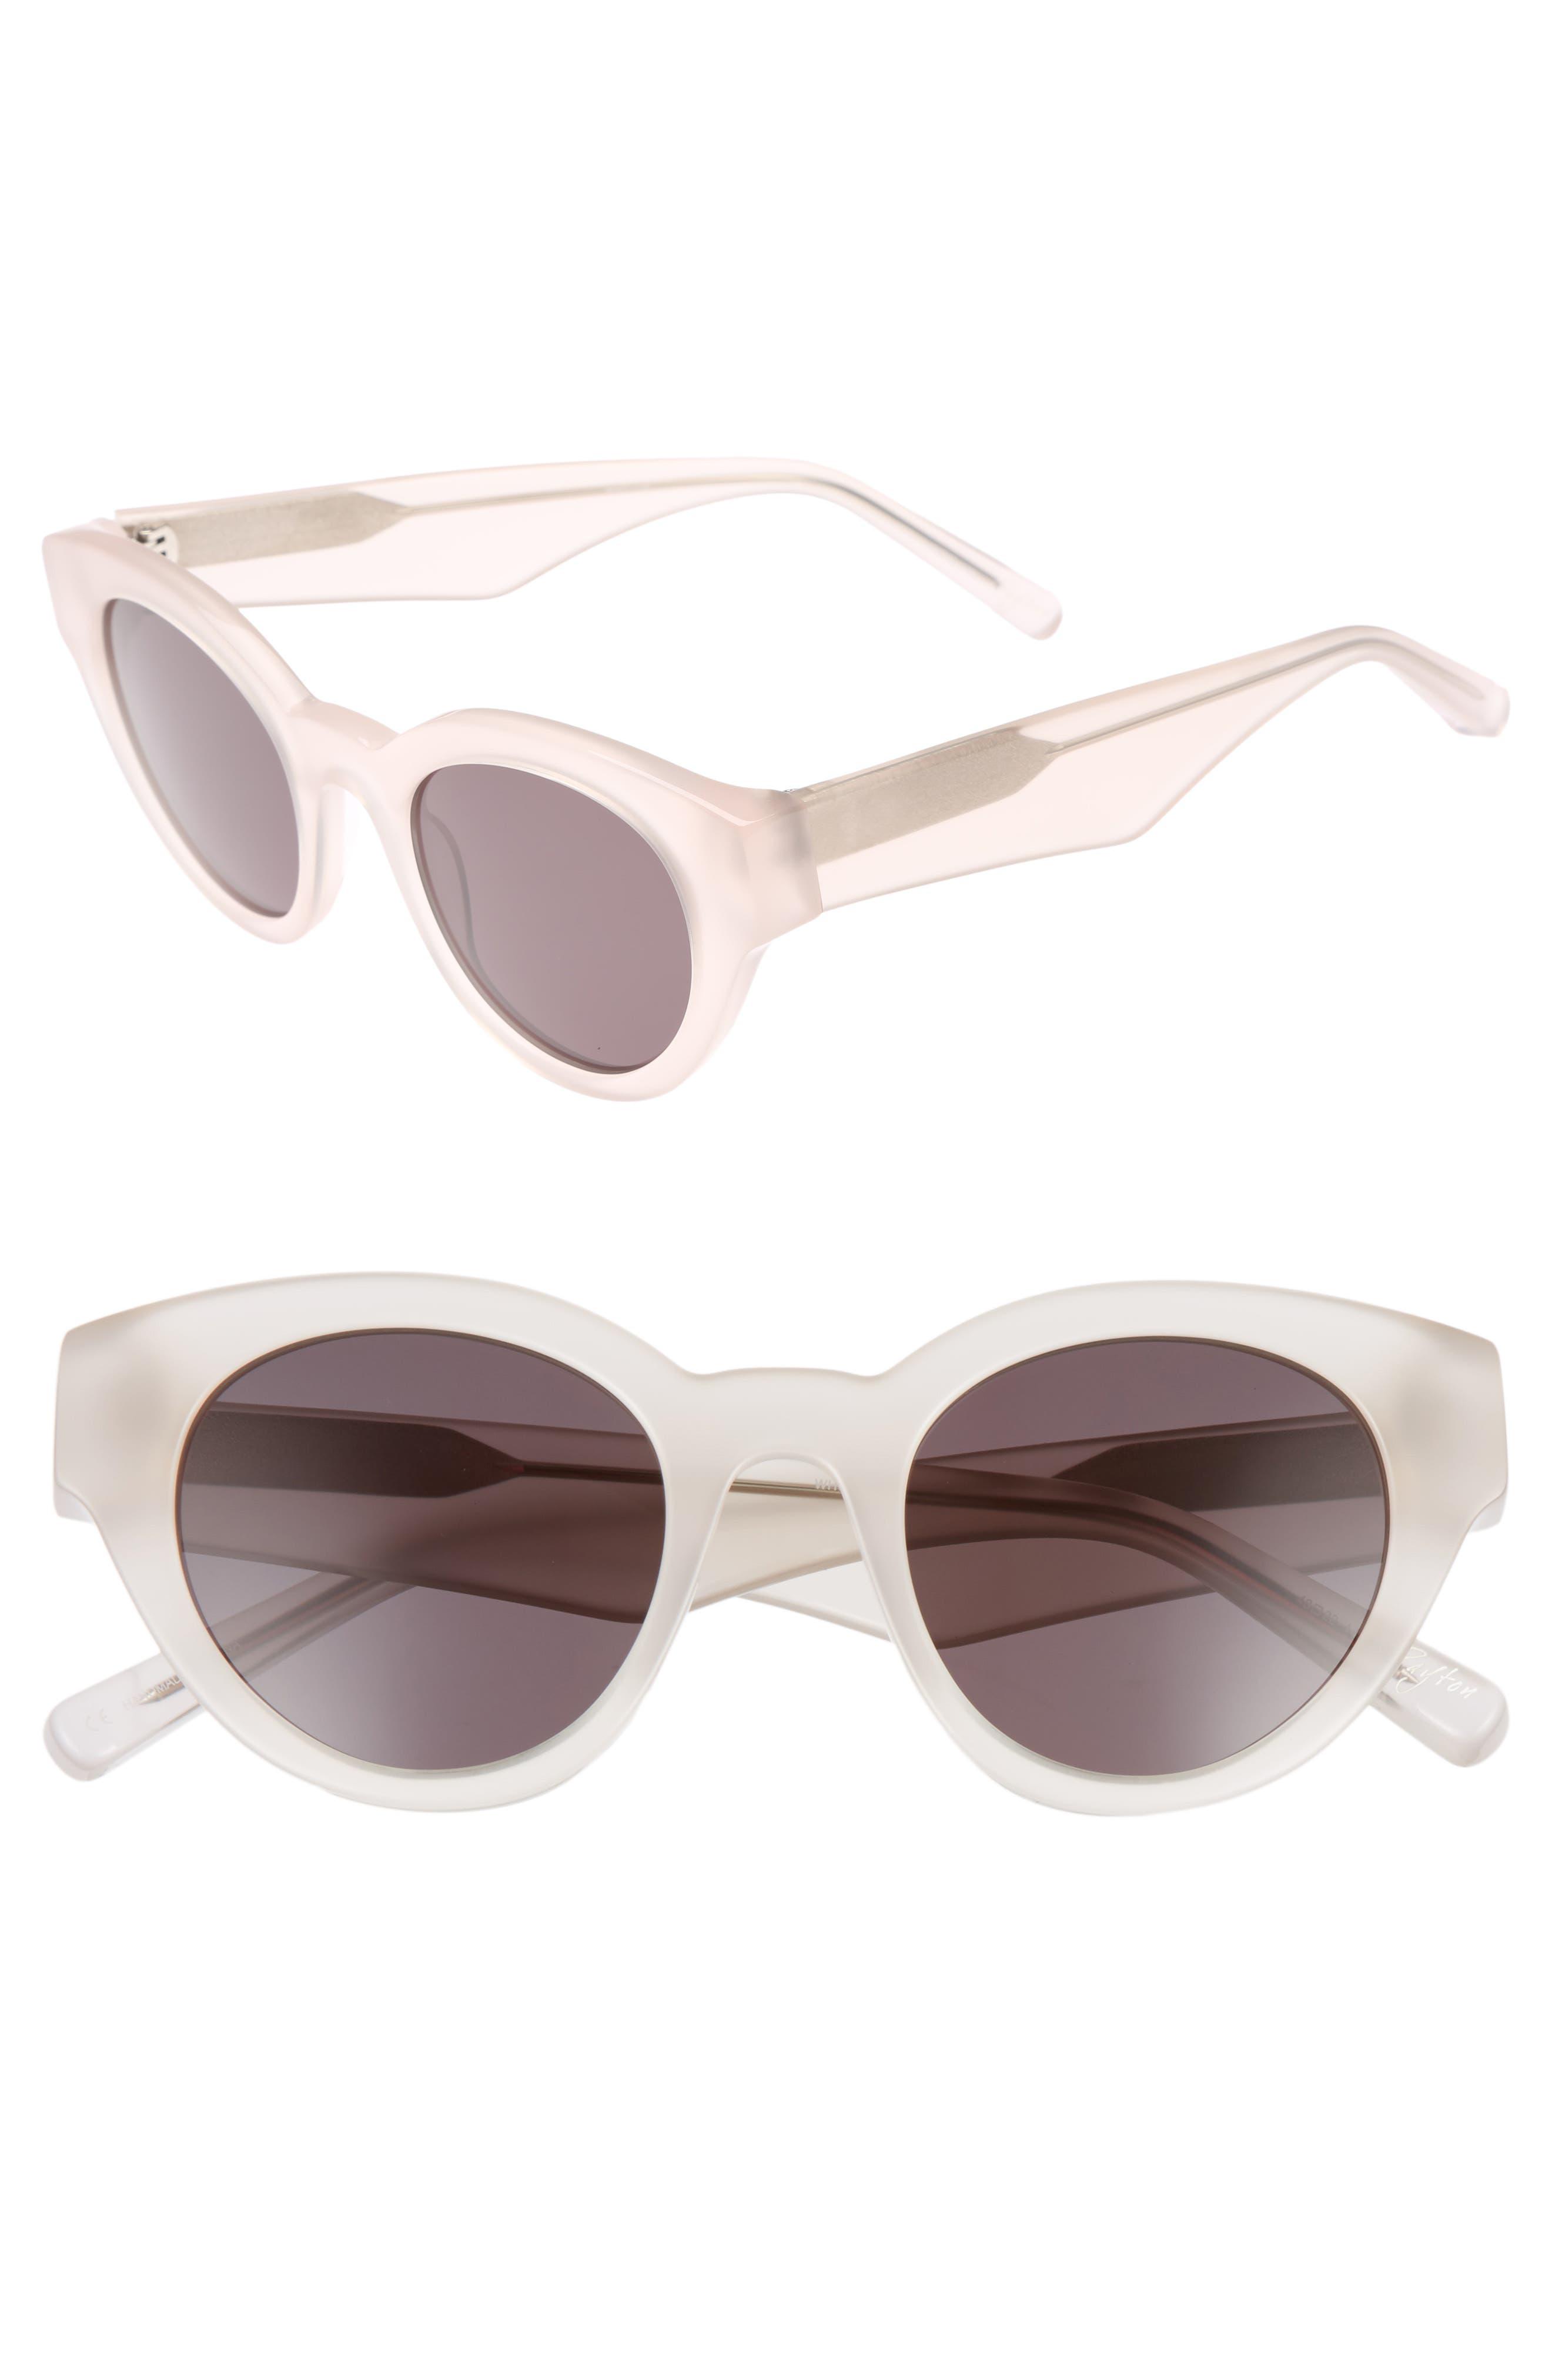 Payton 48mm Cat Eye Sunglasses,                         Main,                         color, White Smoke